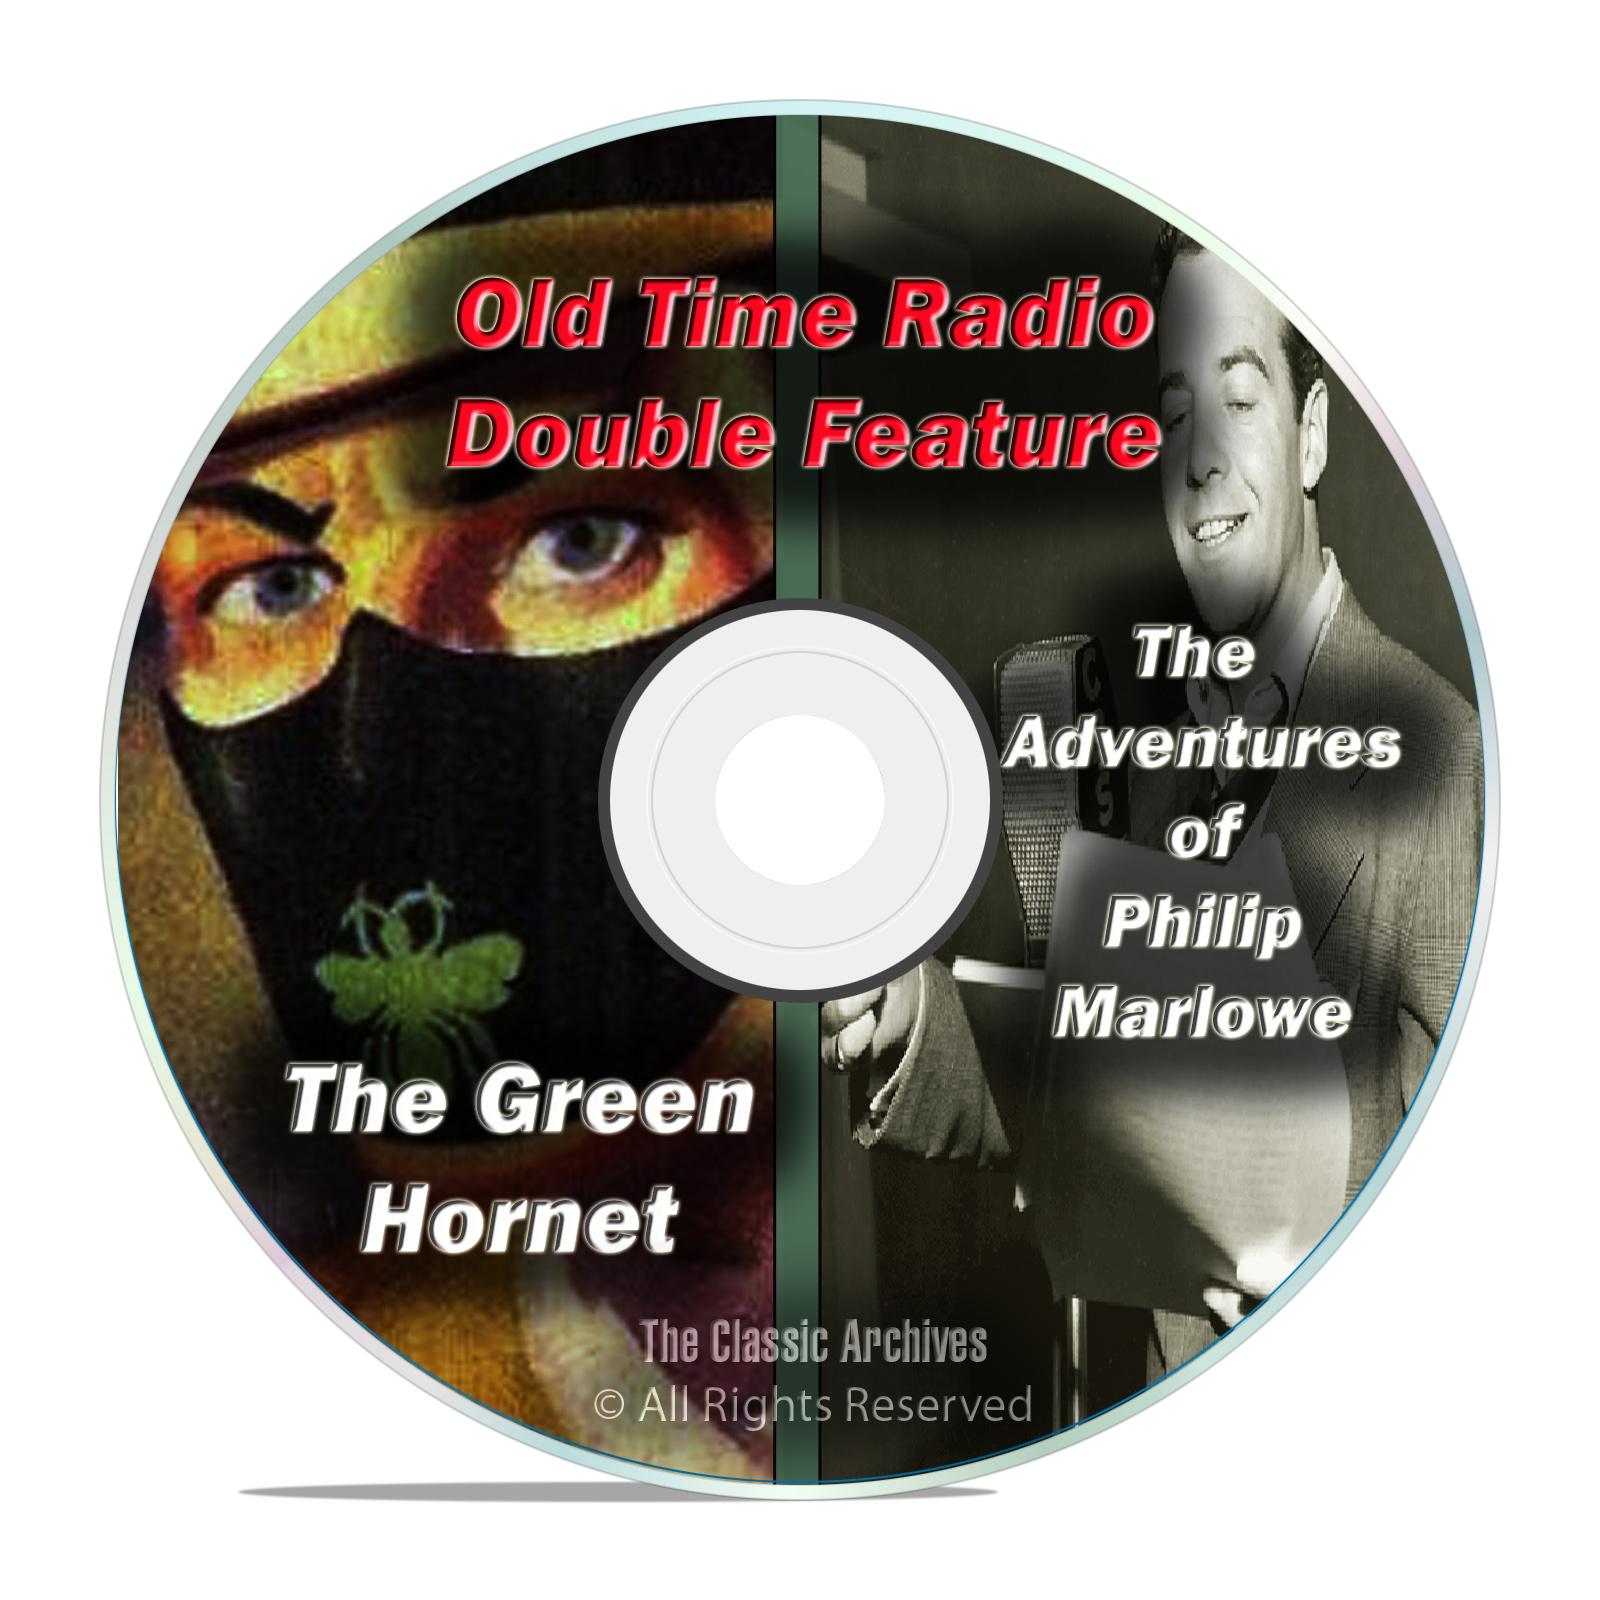 300+ Sherlock Holmes Audiobooks, and OTR Radio Drama Shows